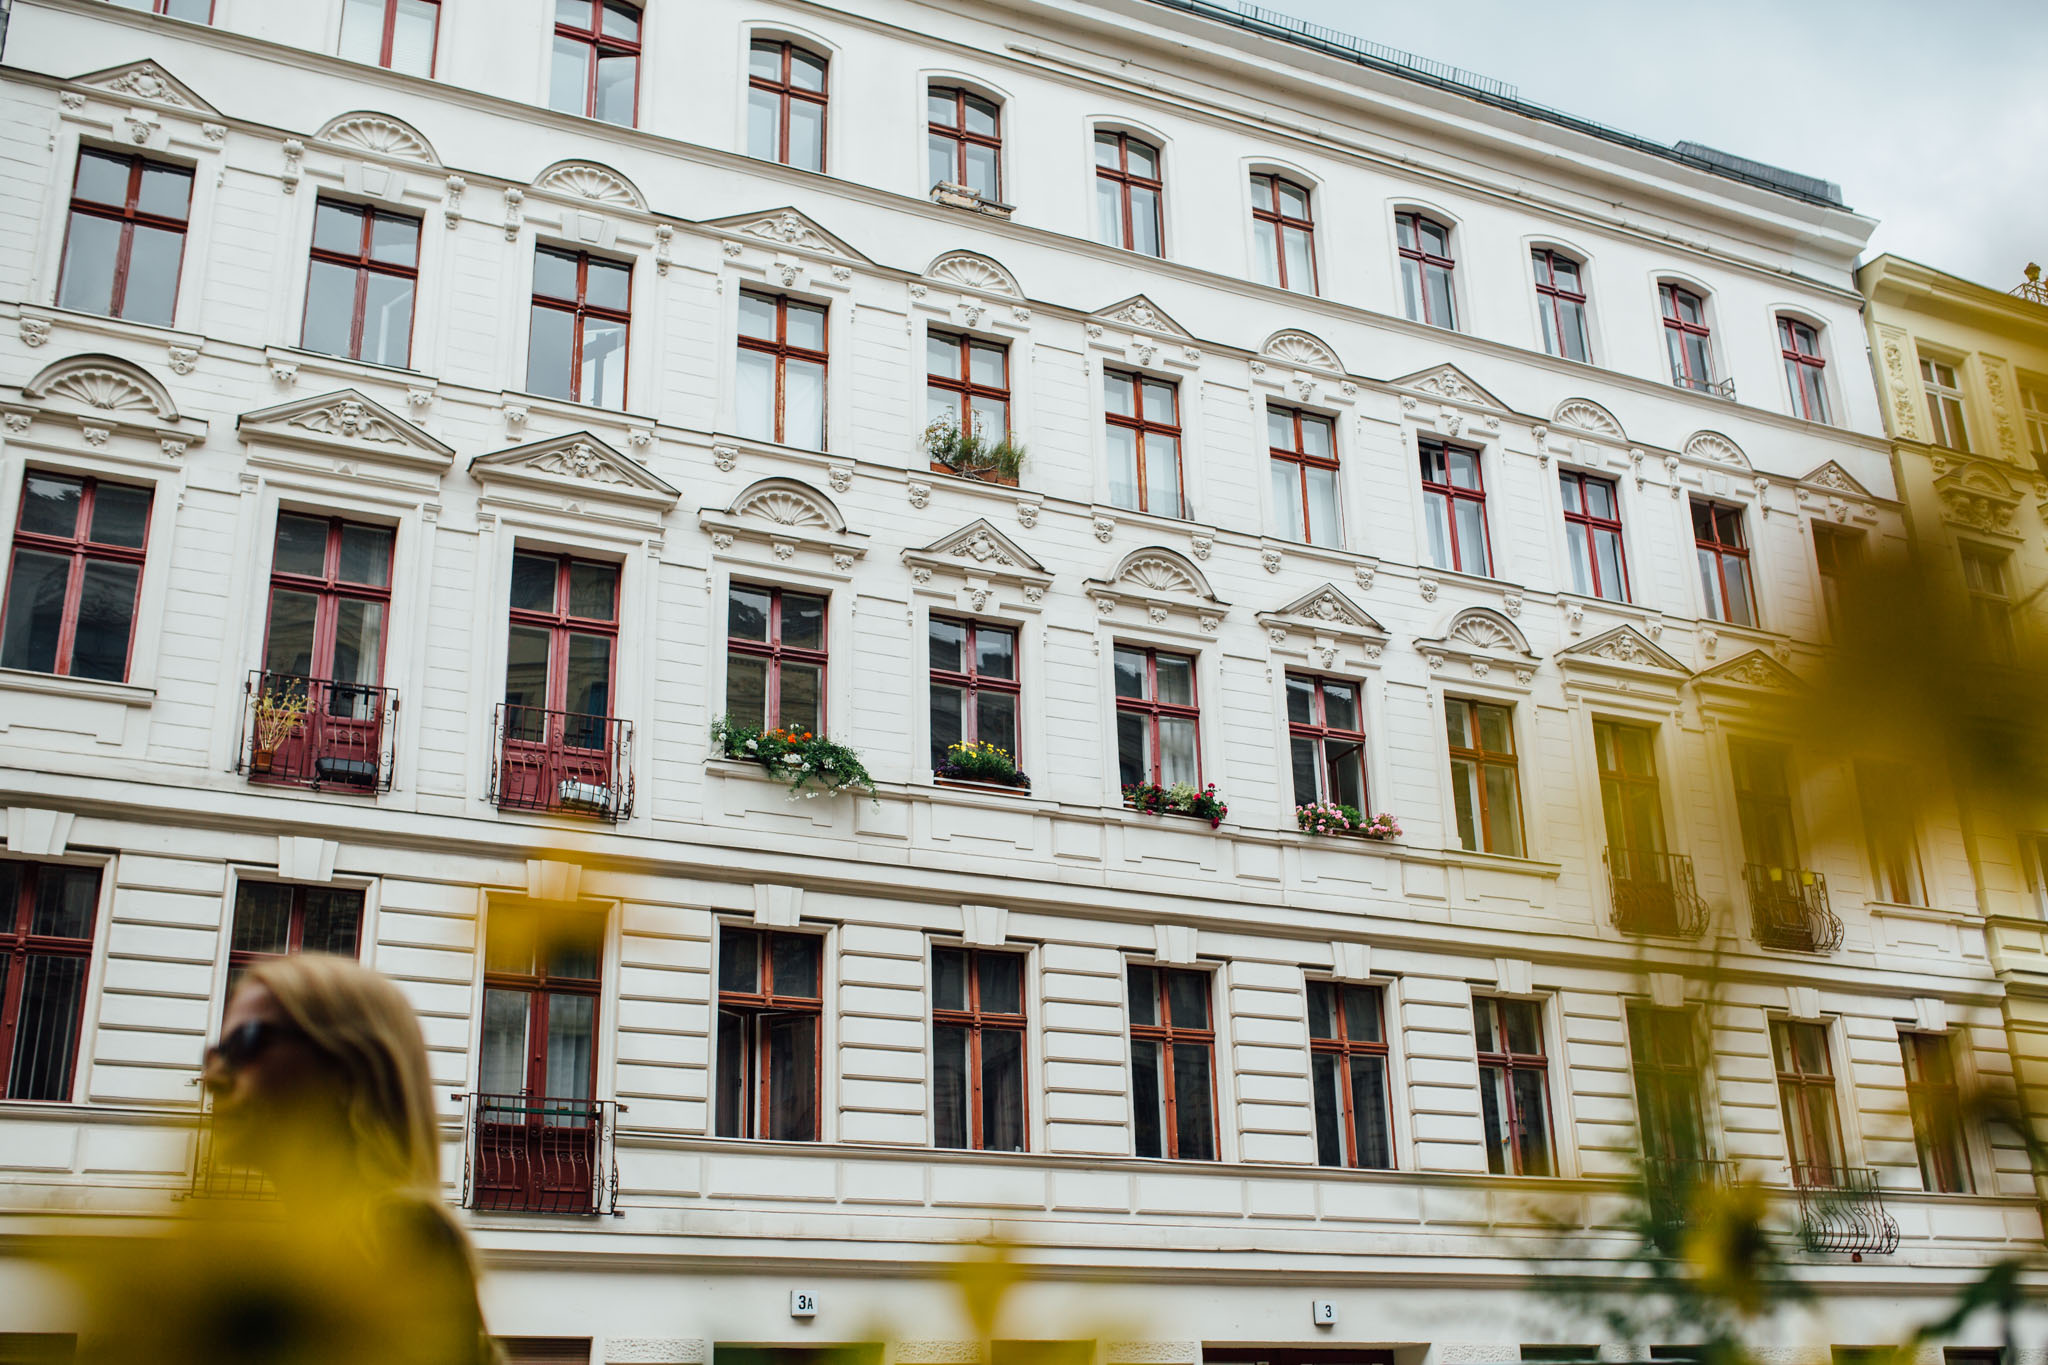 familienfotos-berlin-kreuzberg-fotostory-zuhause